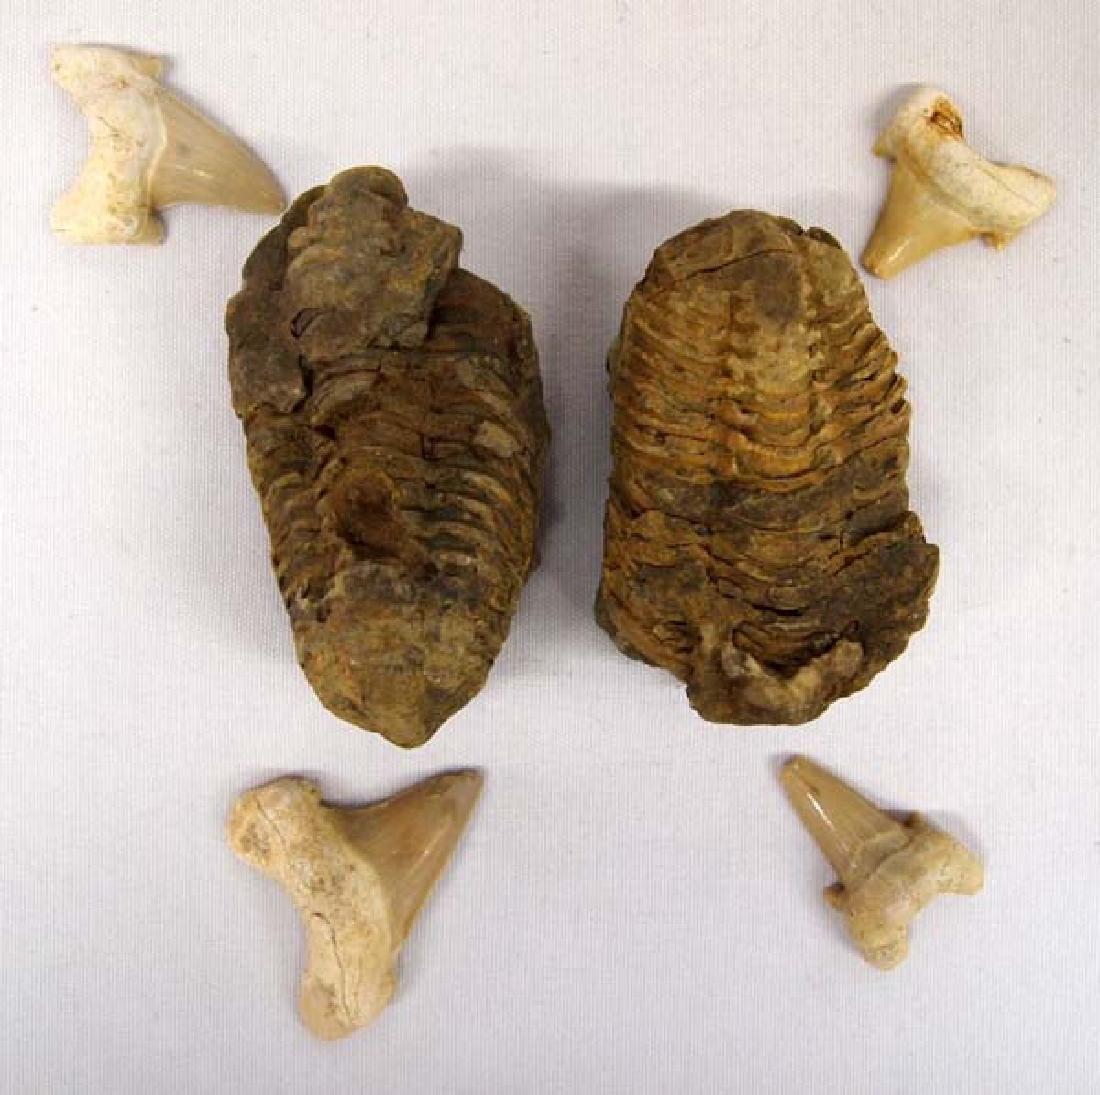 Trilobite Fossils & Shark's Teeth S&H $8.00